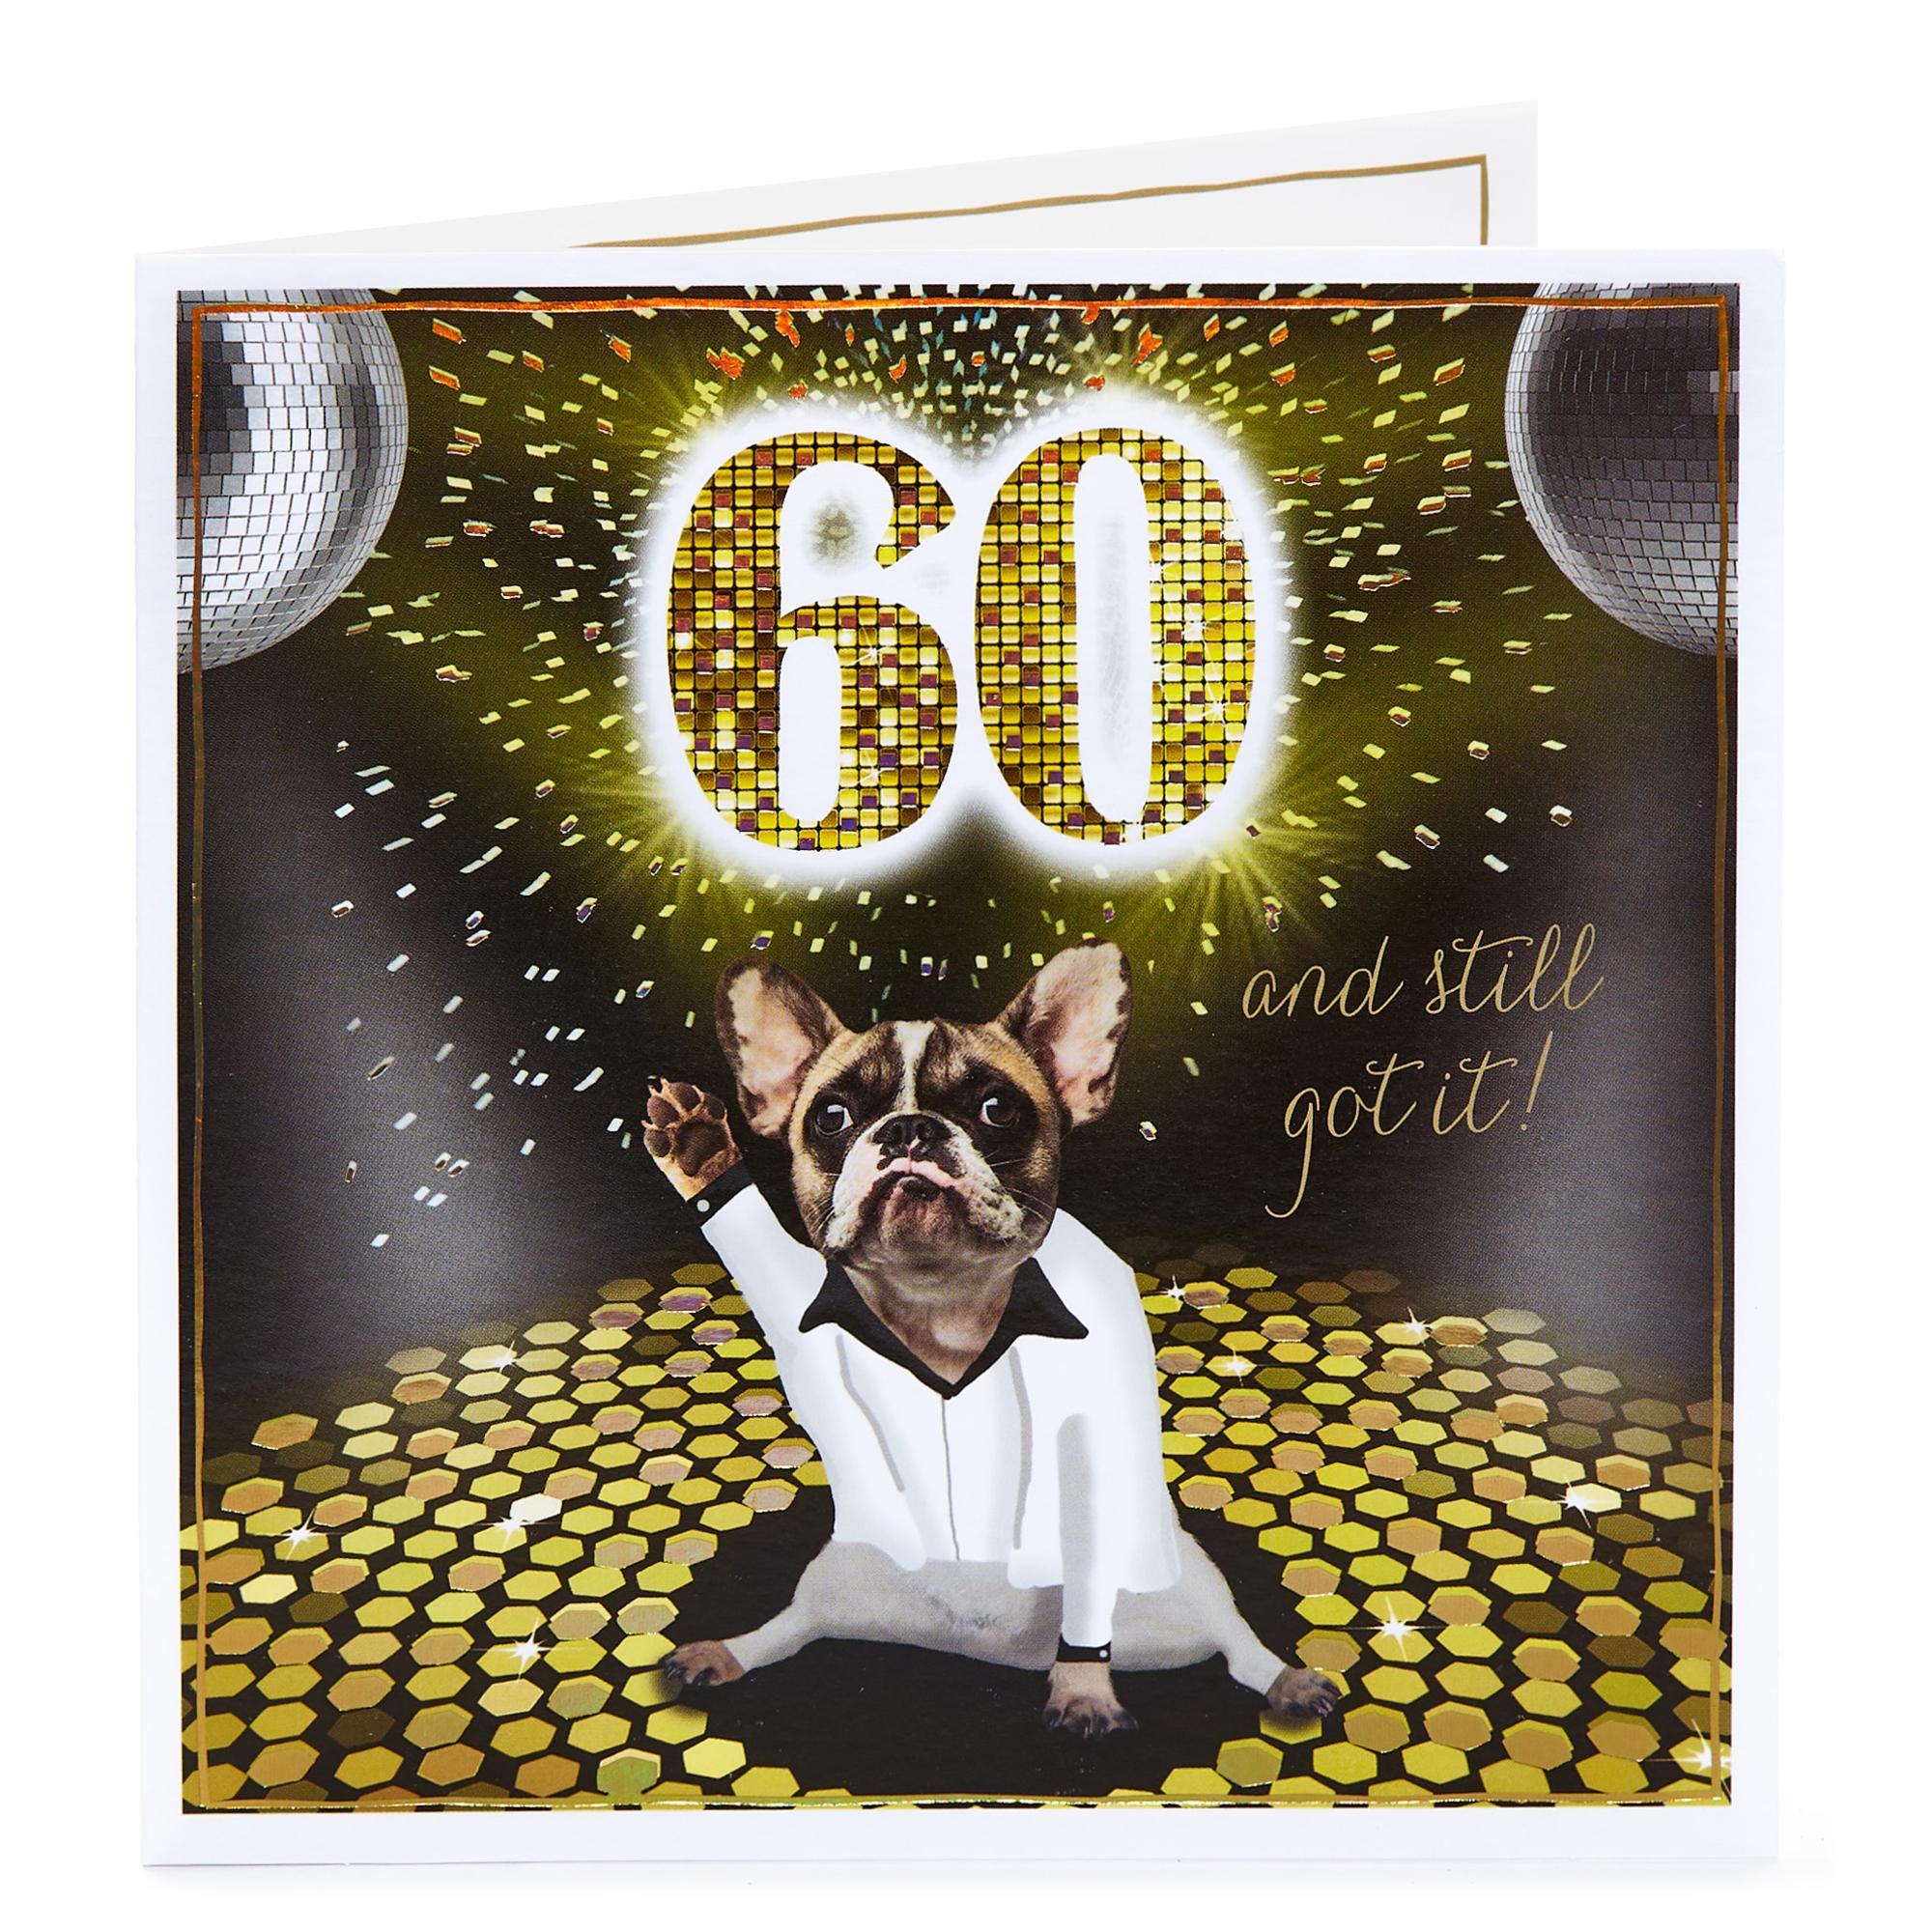 buy 60th birthday card  still got it for gbp 099  card